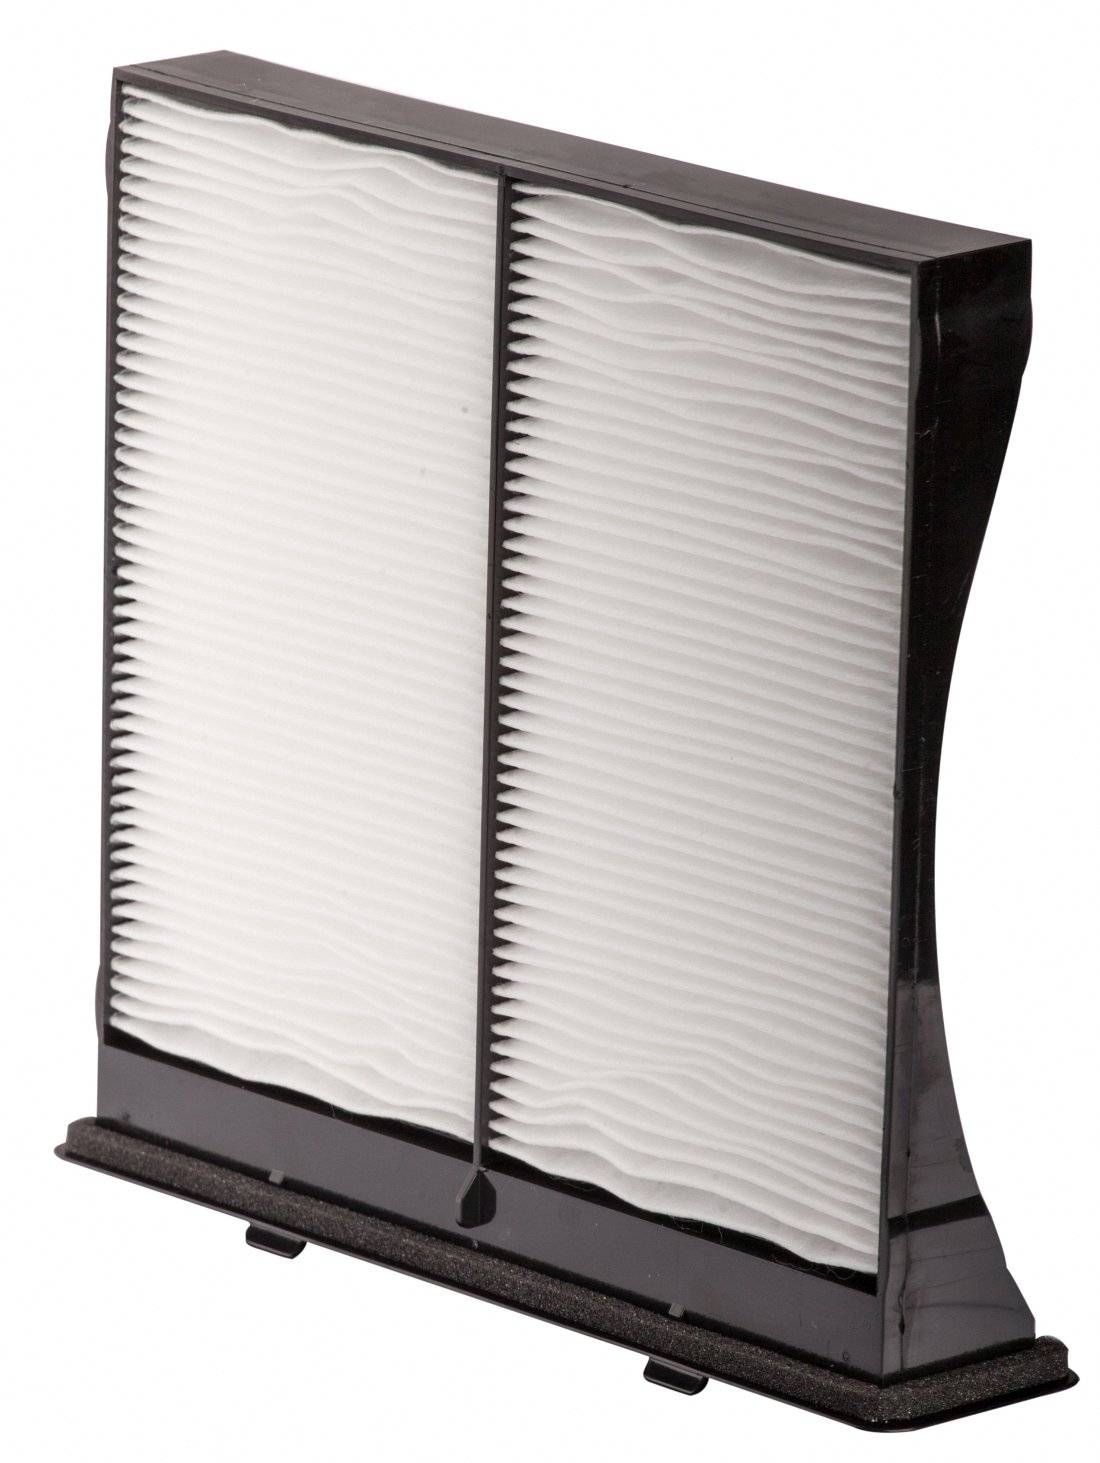 Premium Guard PC6115 Cabin Air Filter